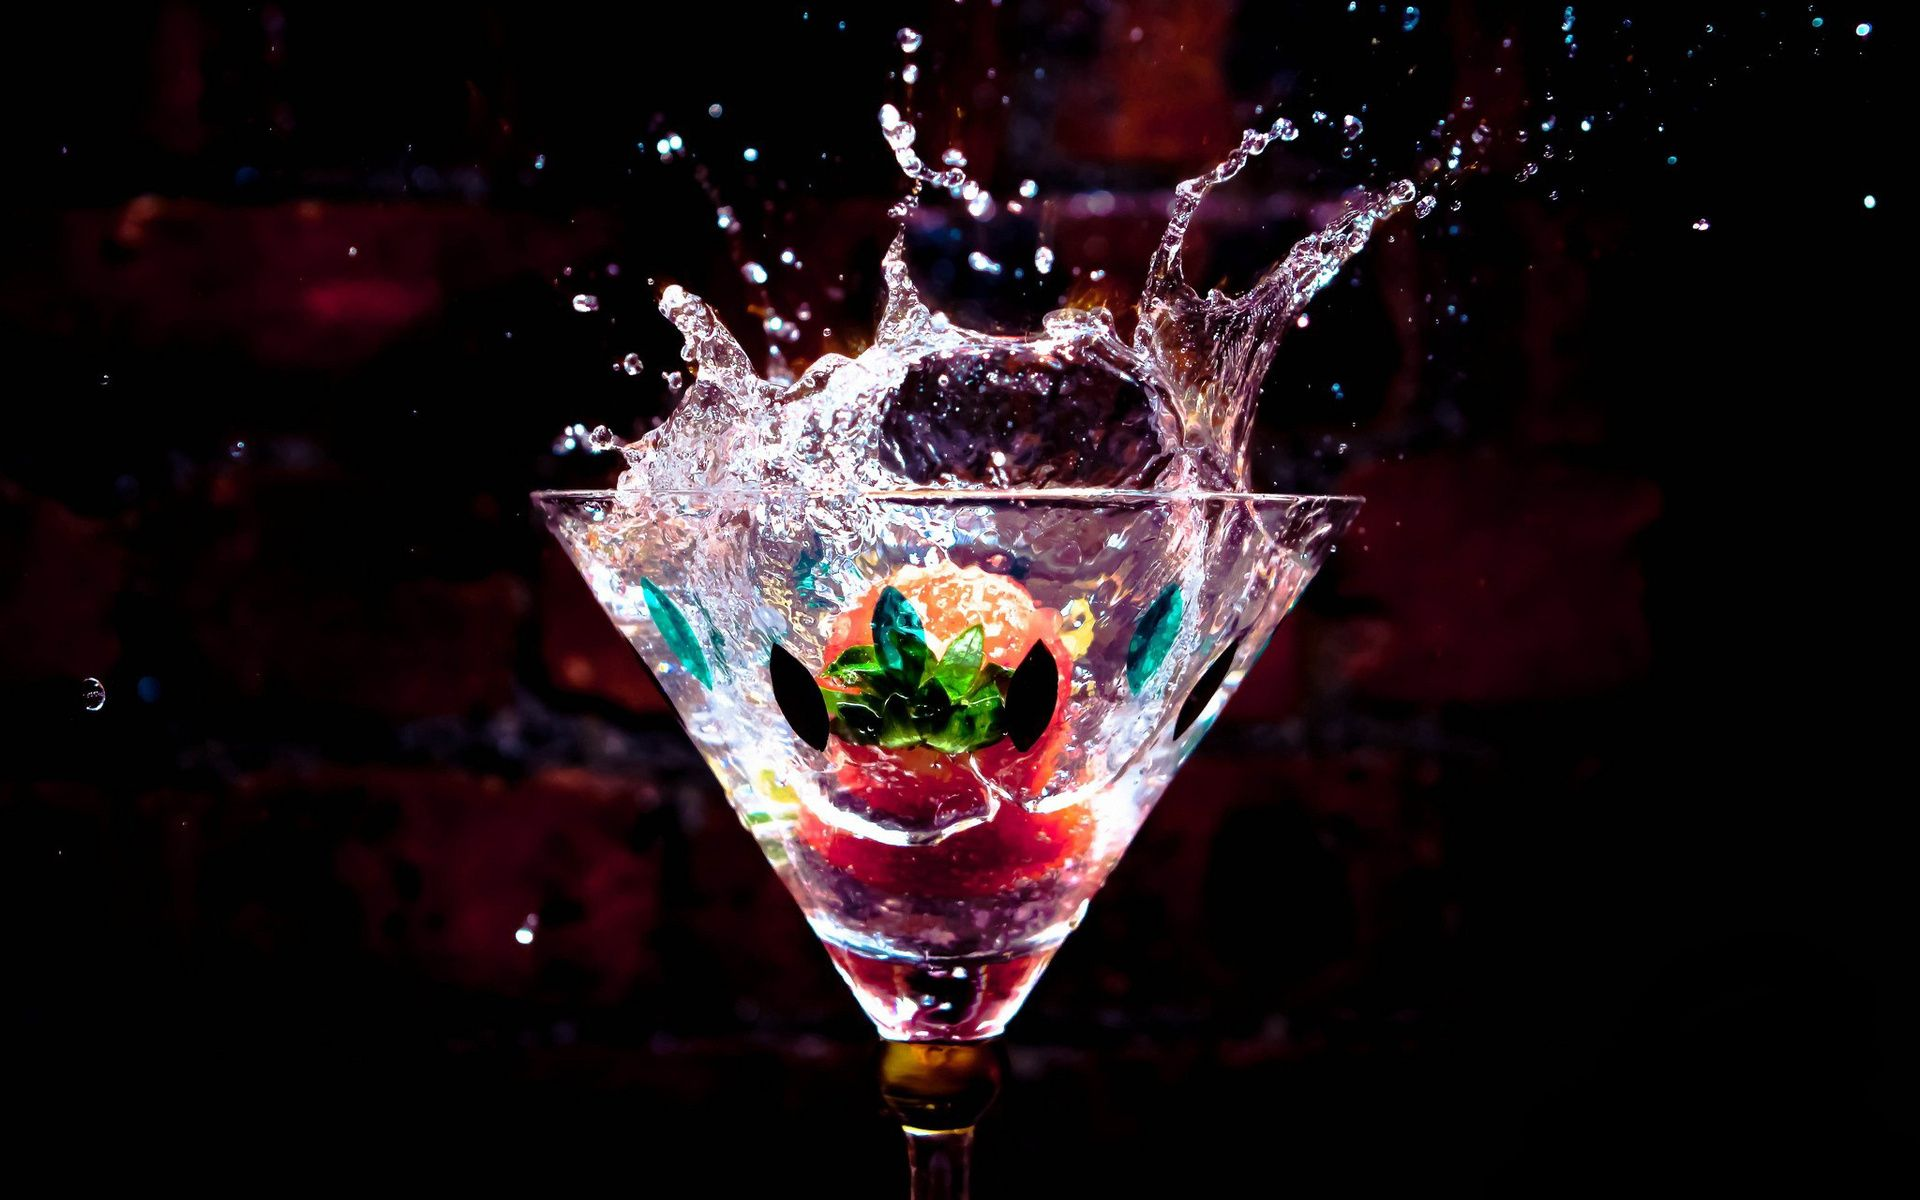 Cosmopolitan cocktail wallpaper  Drink Fresh Images HD Black Background Images Free #45219982183 ...